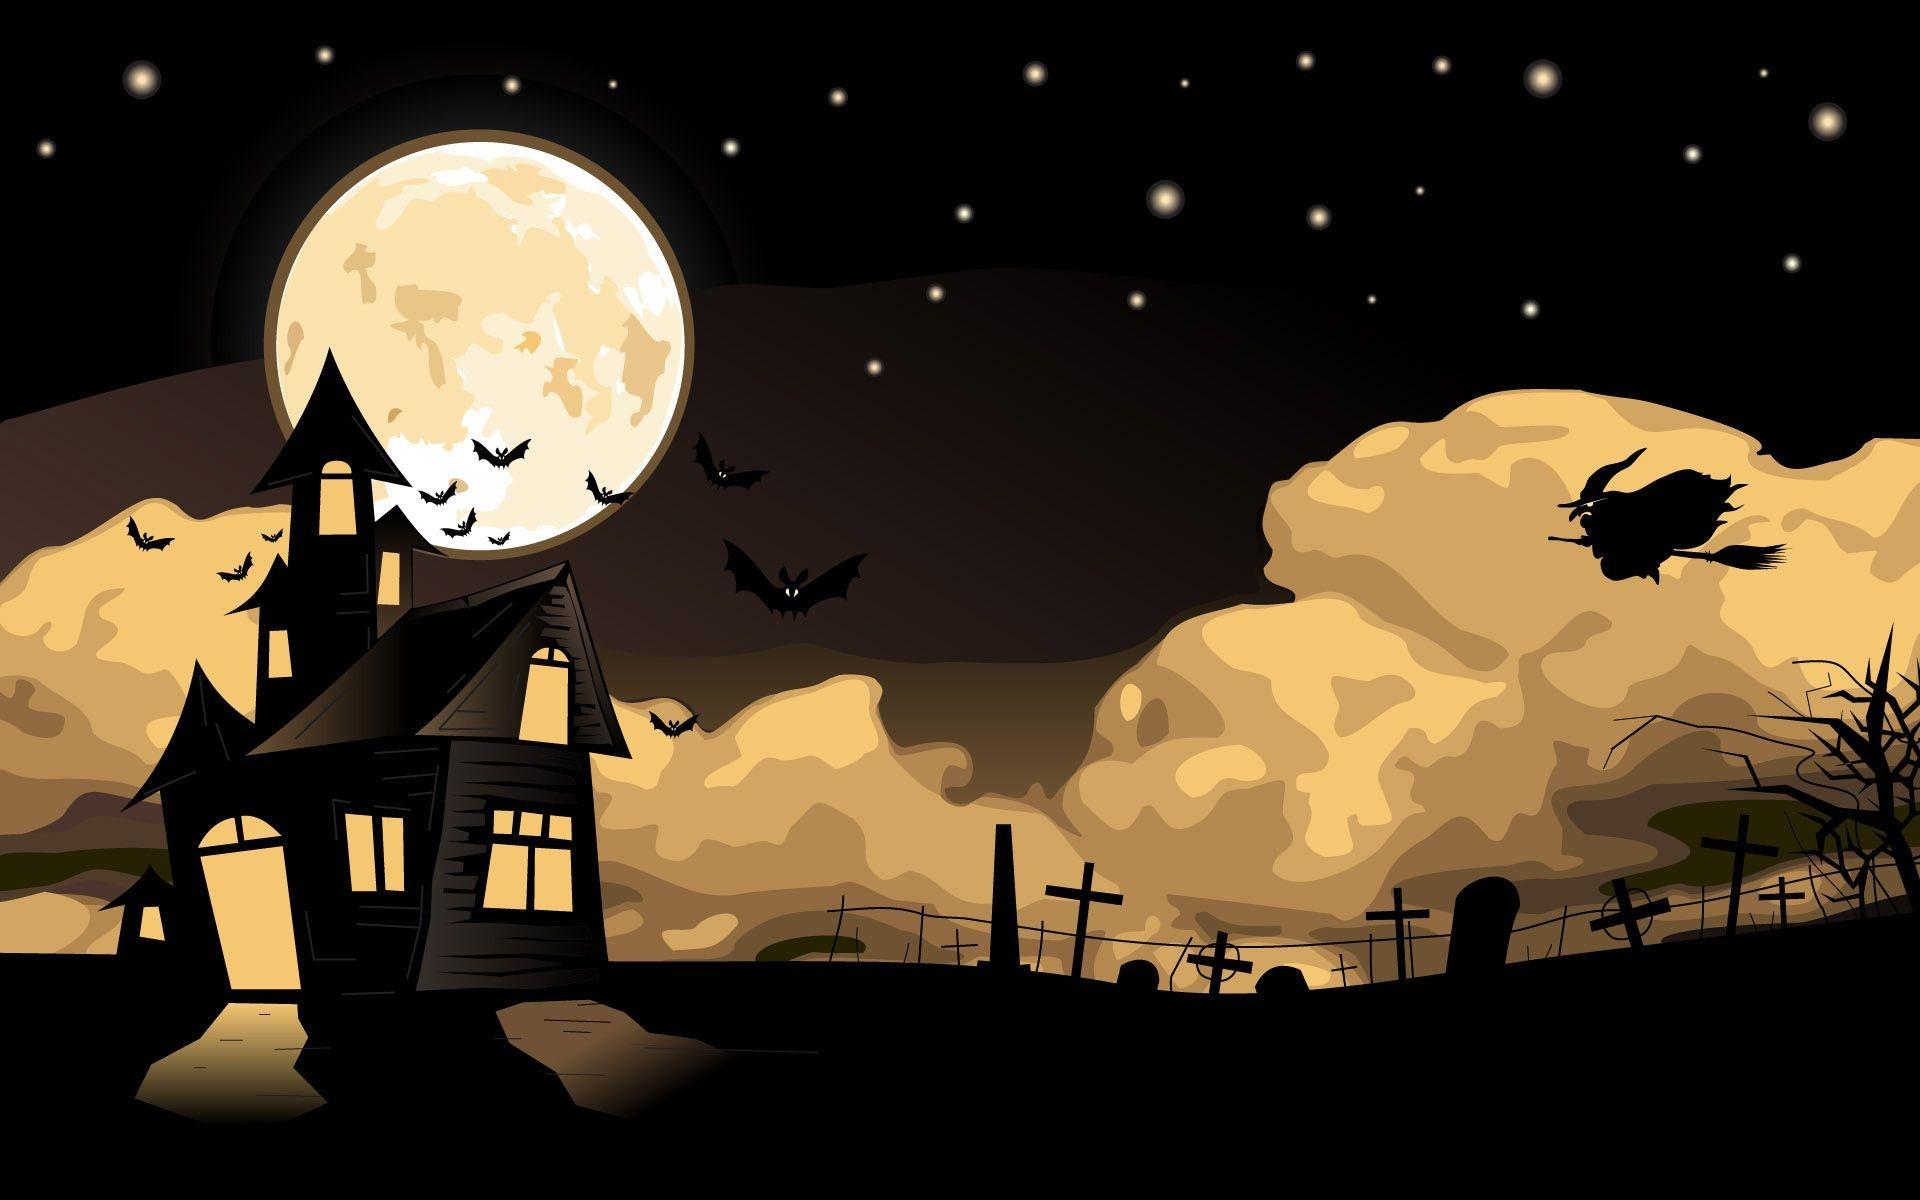 Halloween hd wallpaper free download